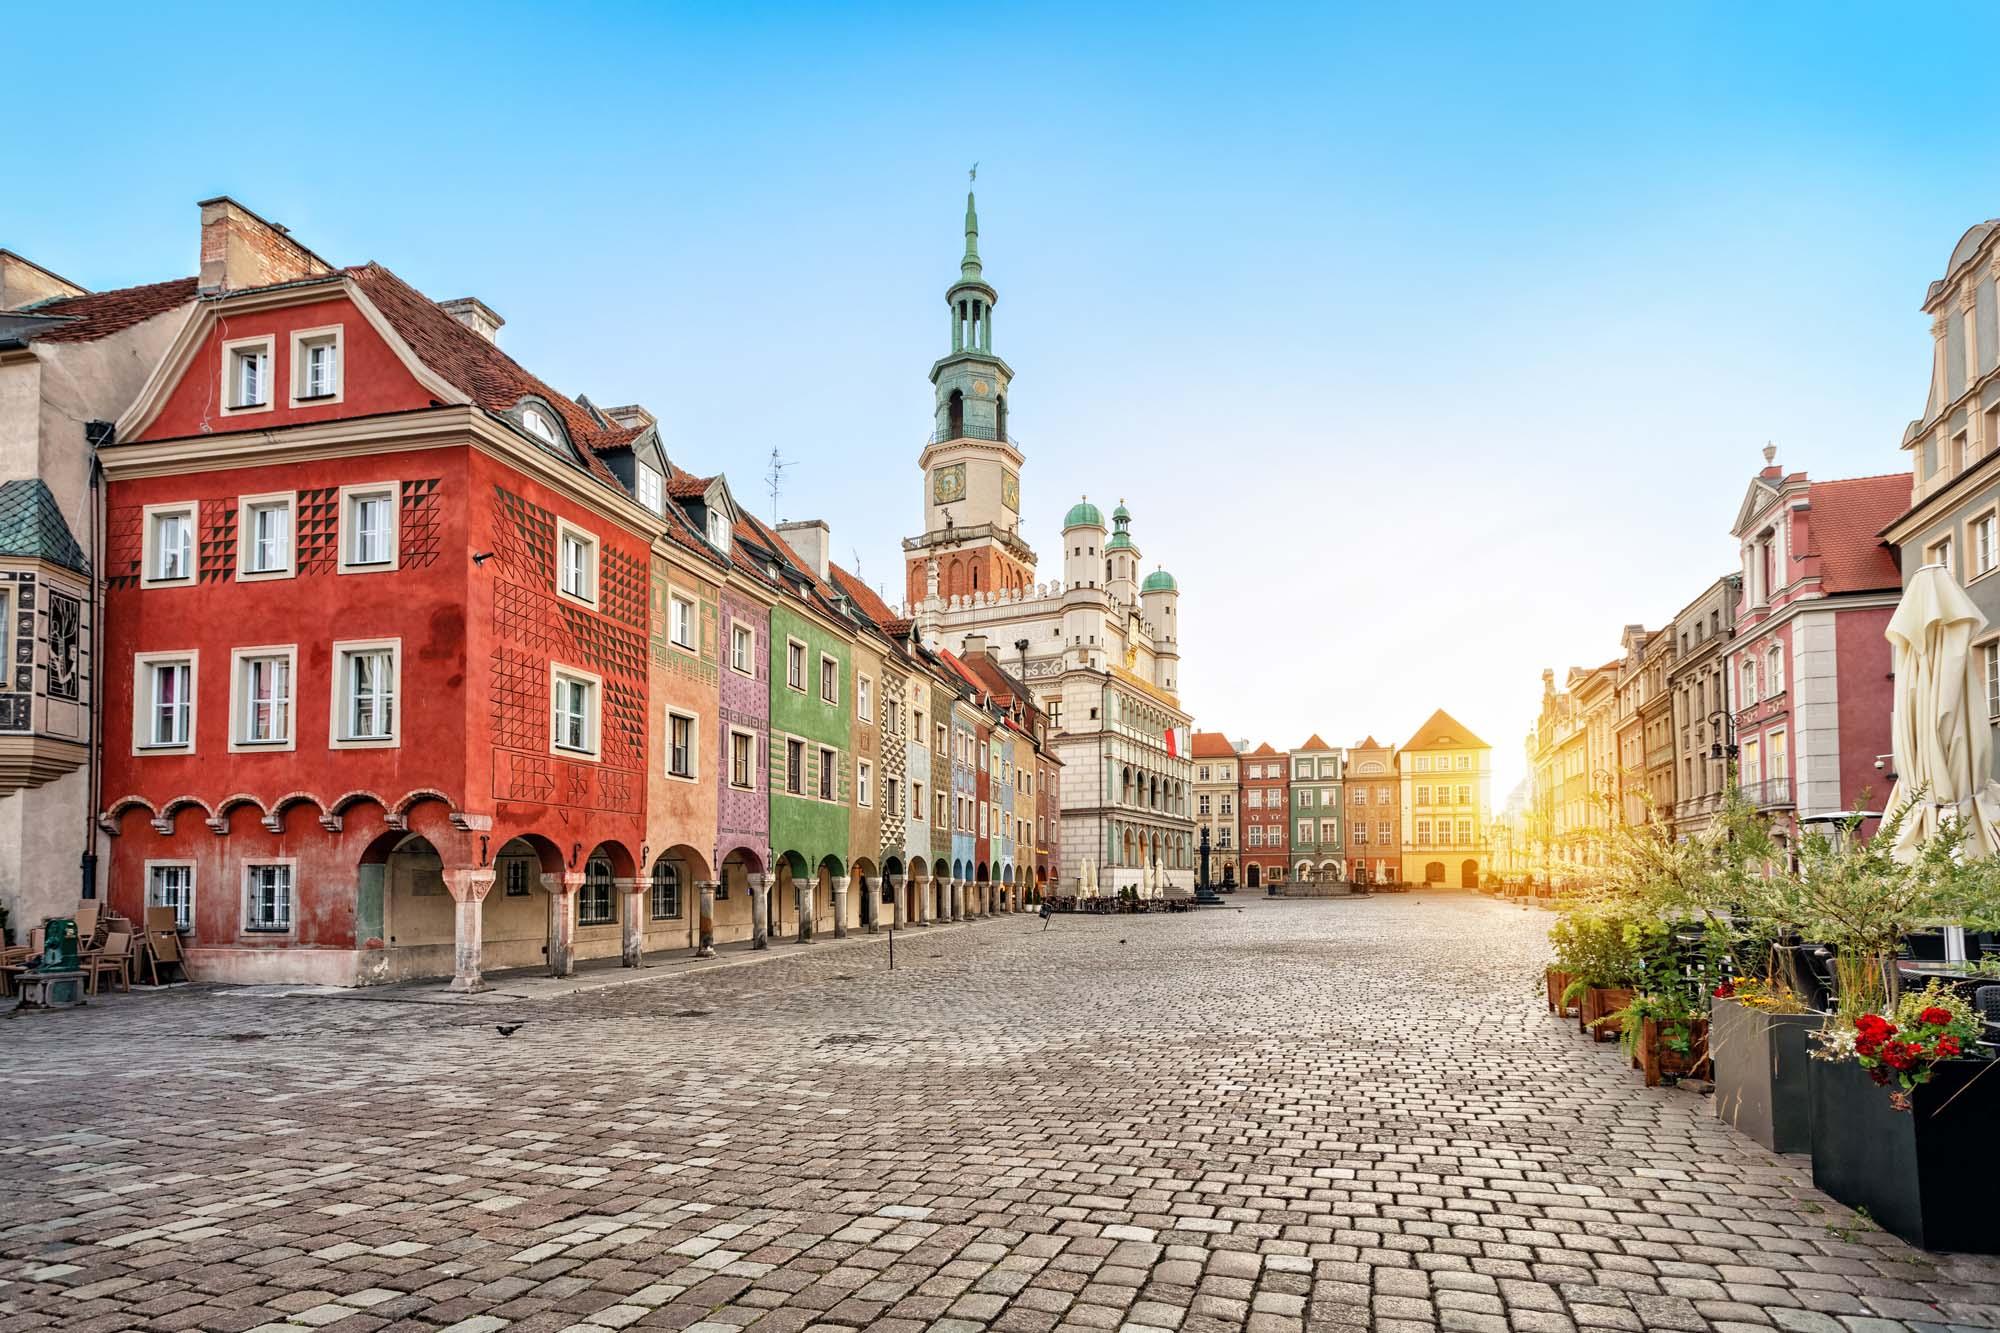 Poznan, Poland eid summer travel destination ideas